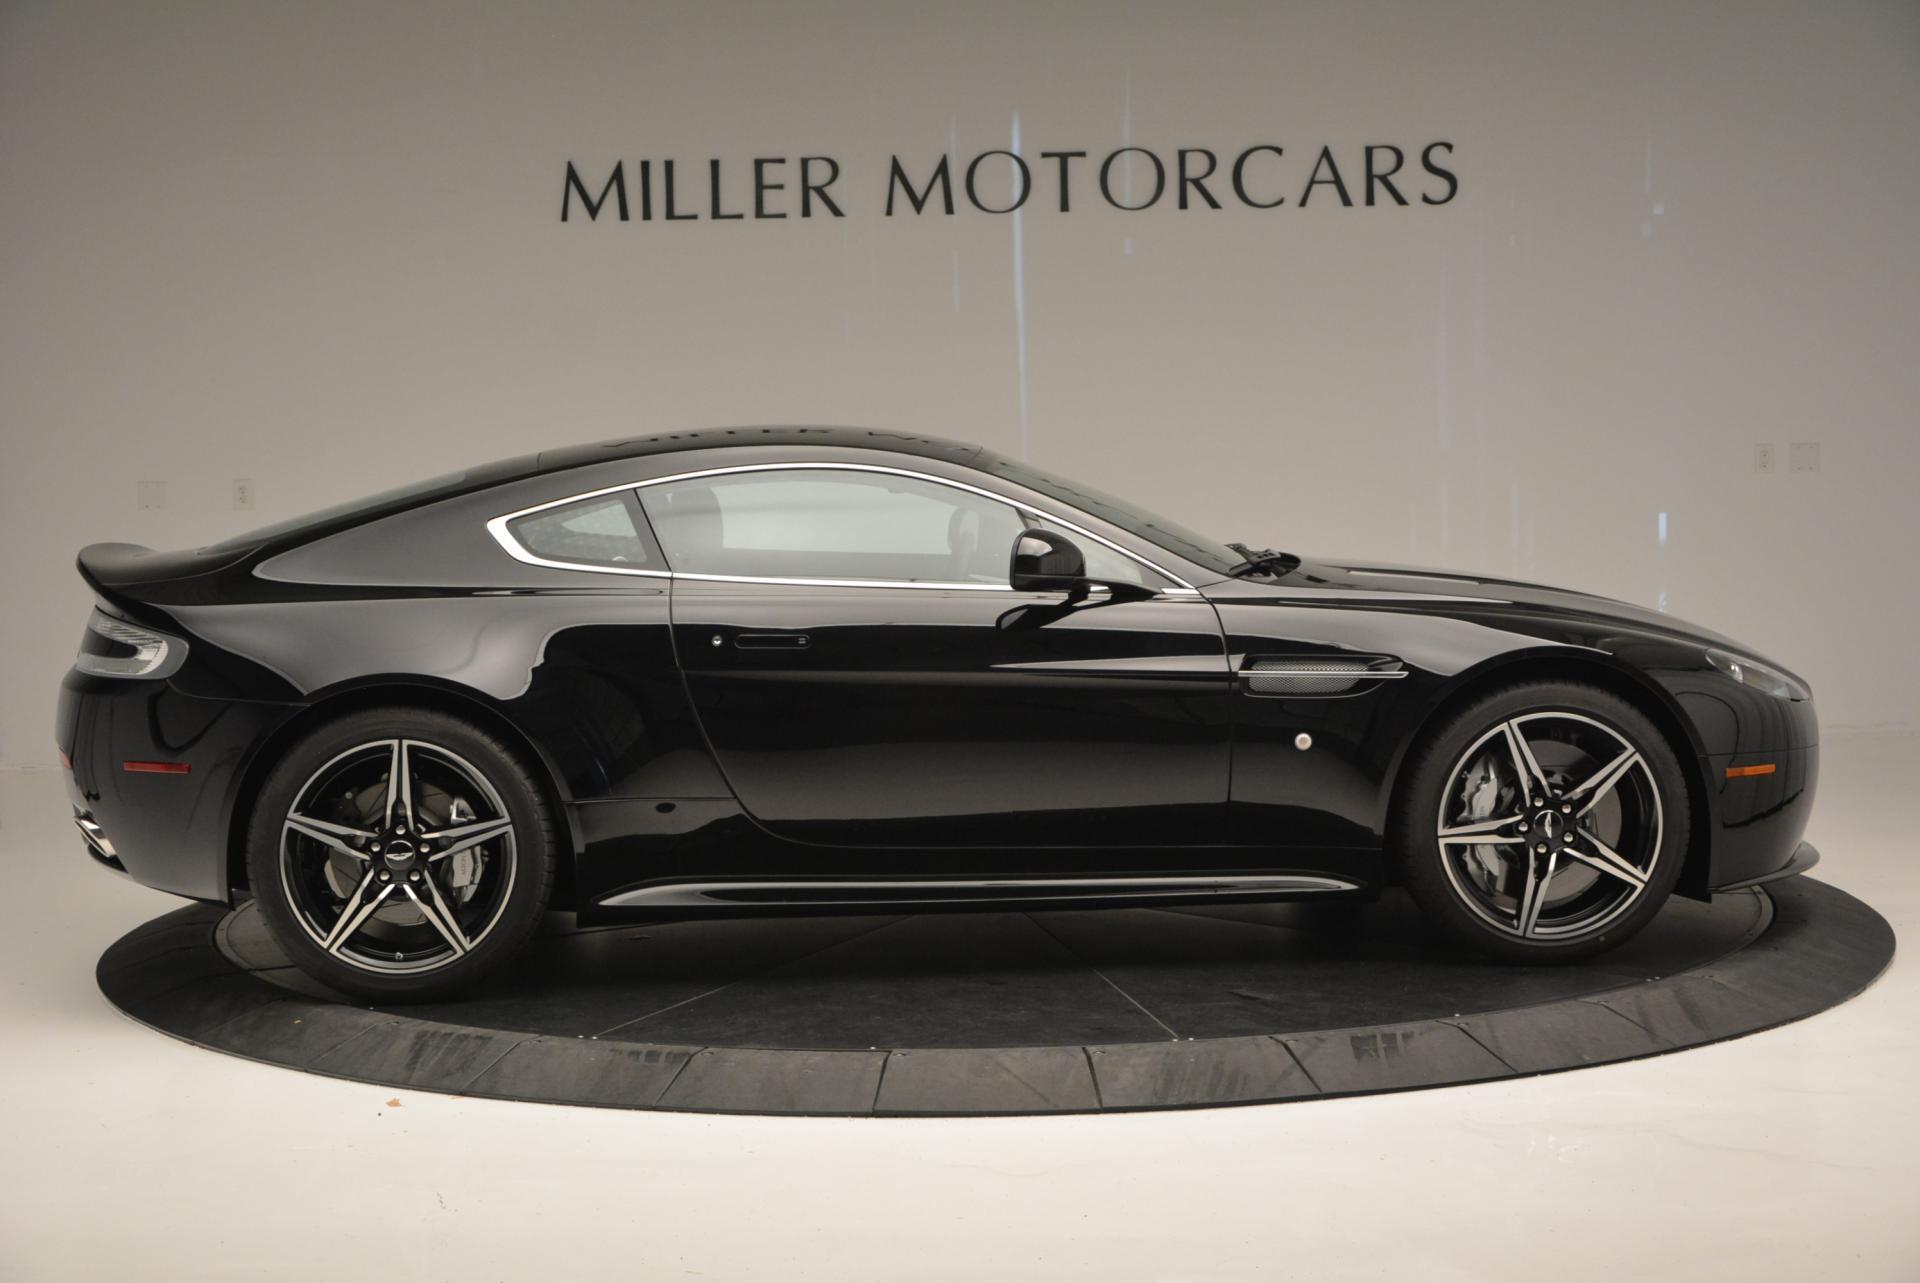 New 2016 Aston Martin V8 Vantage GTS S For Sale In Greenwich, CT 526_p9